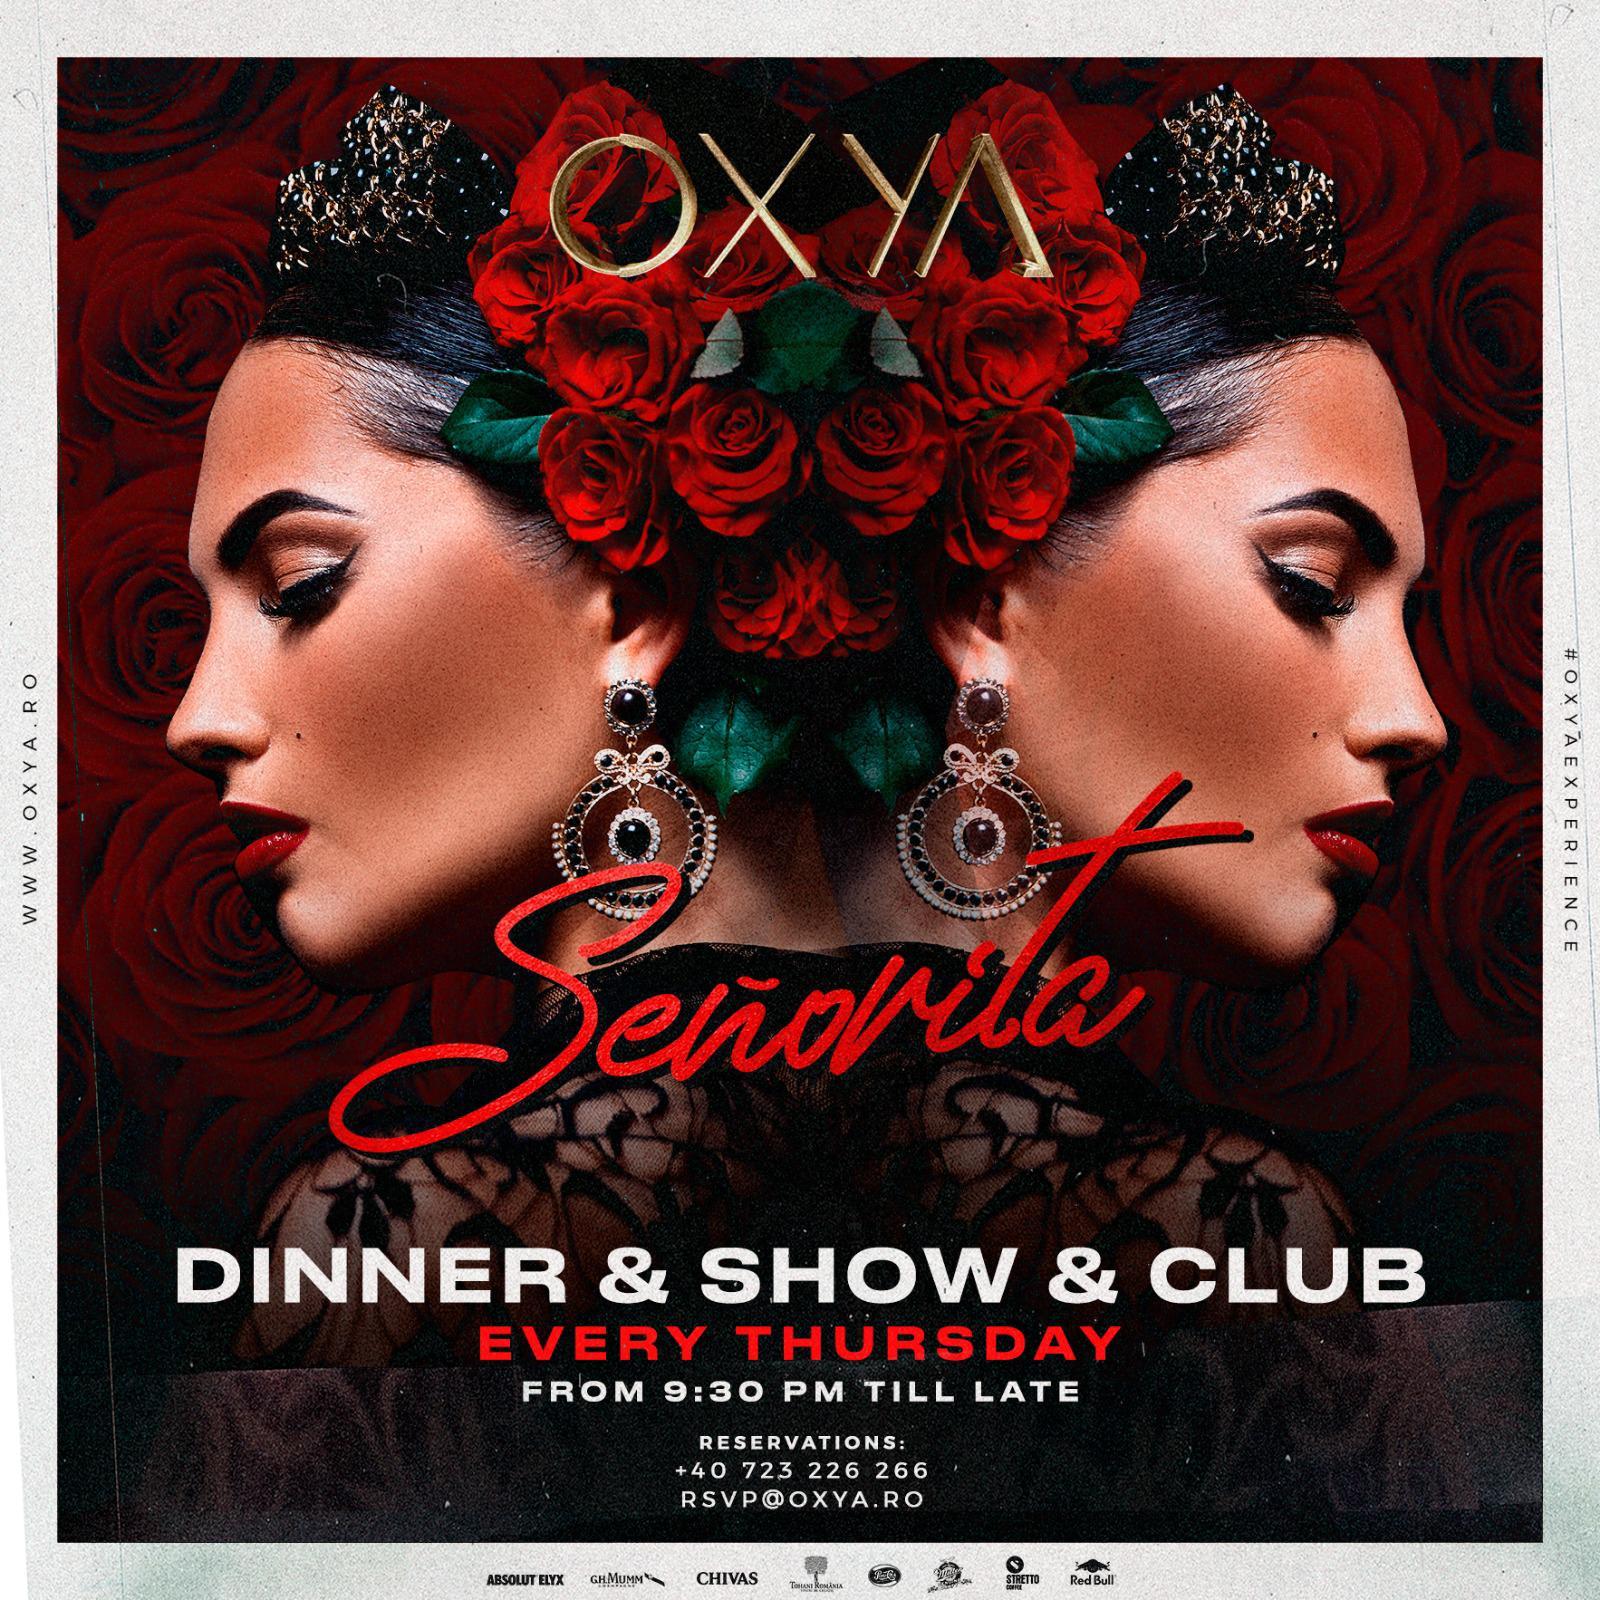 Señorita Party at OXYA